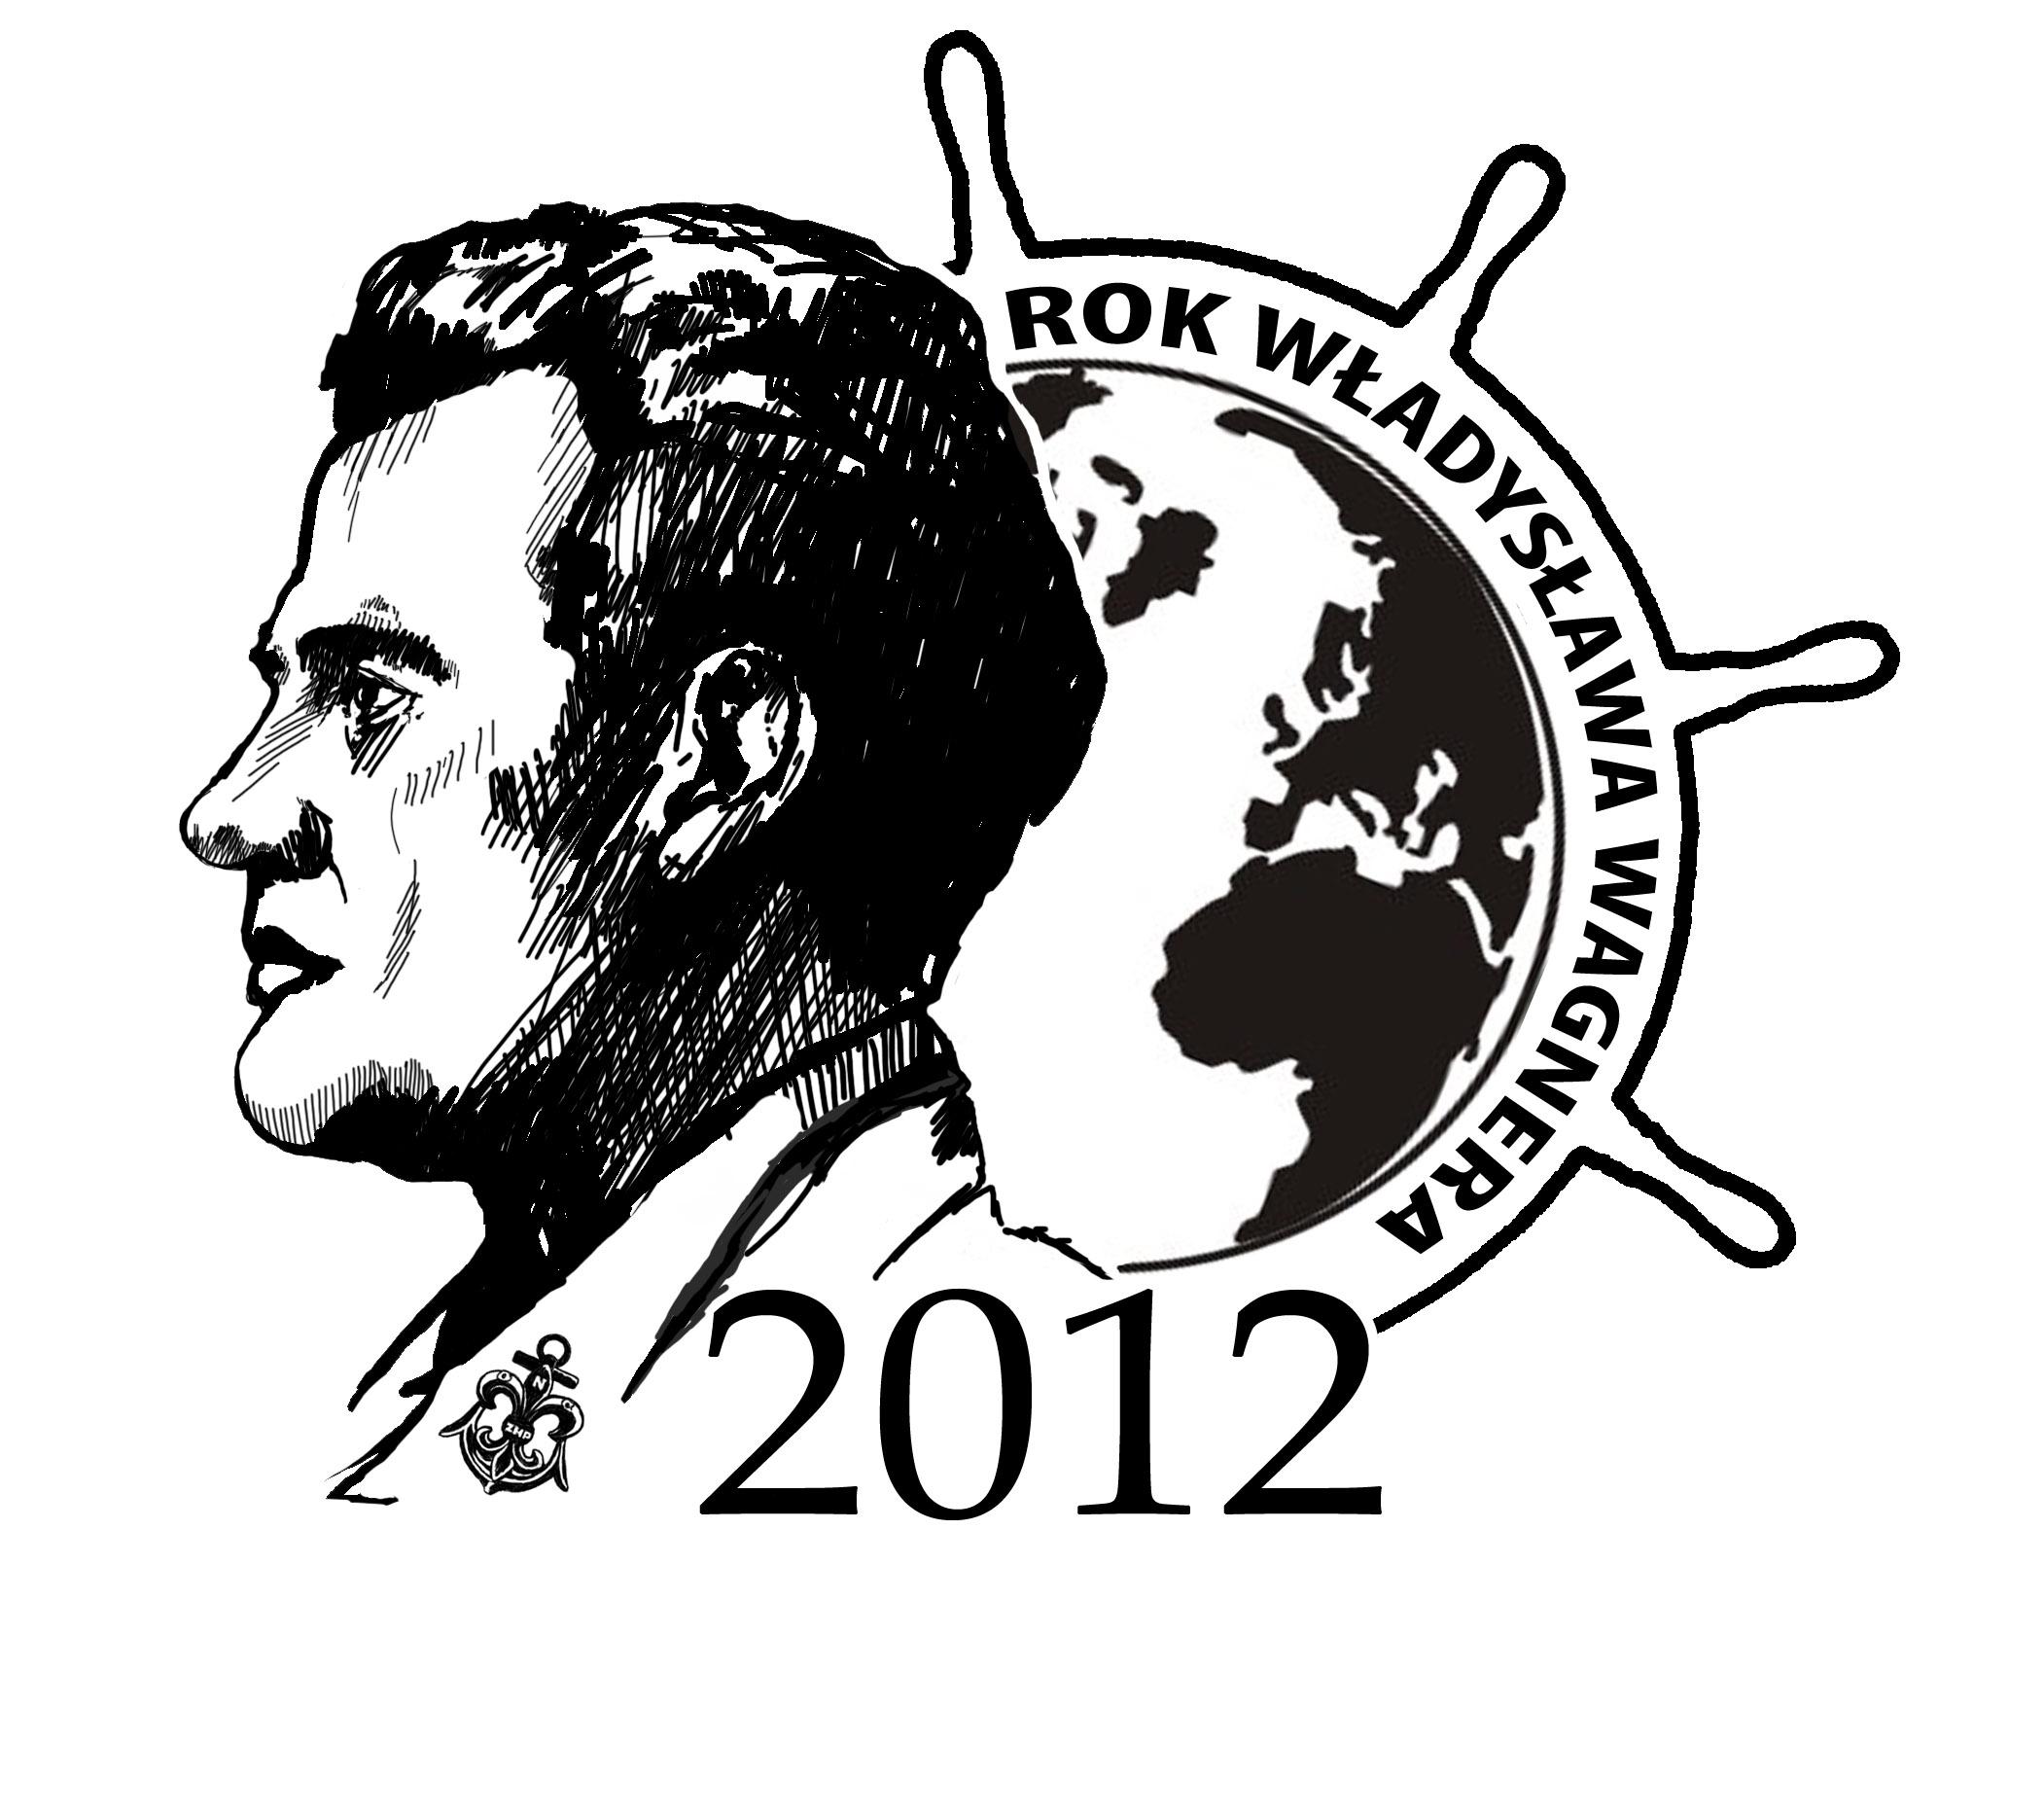 2012 - Rok Wagnera